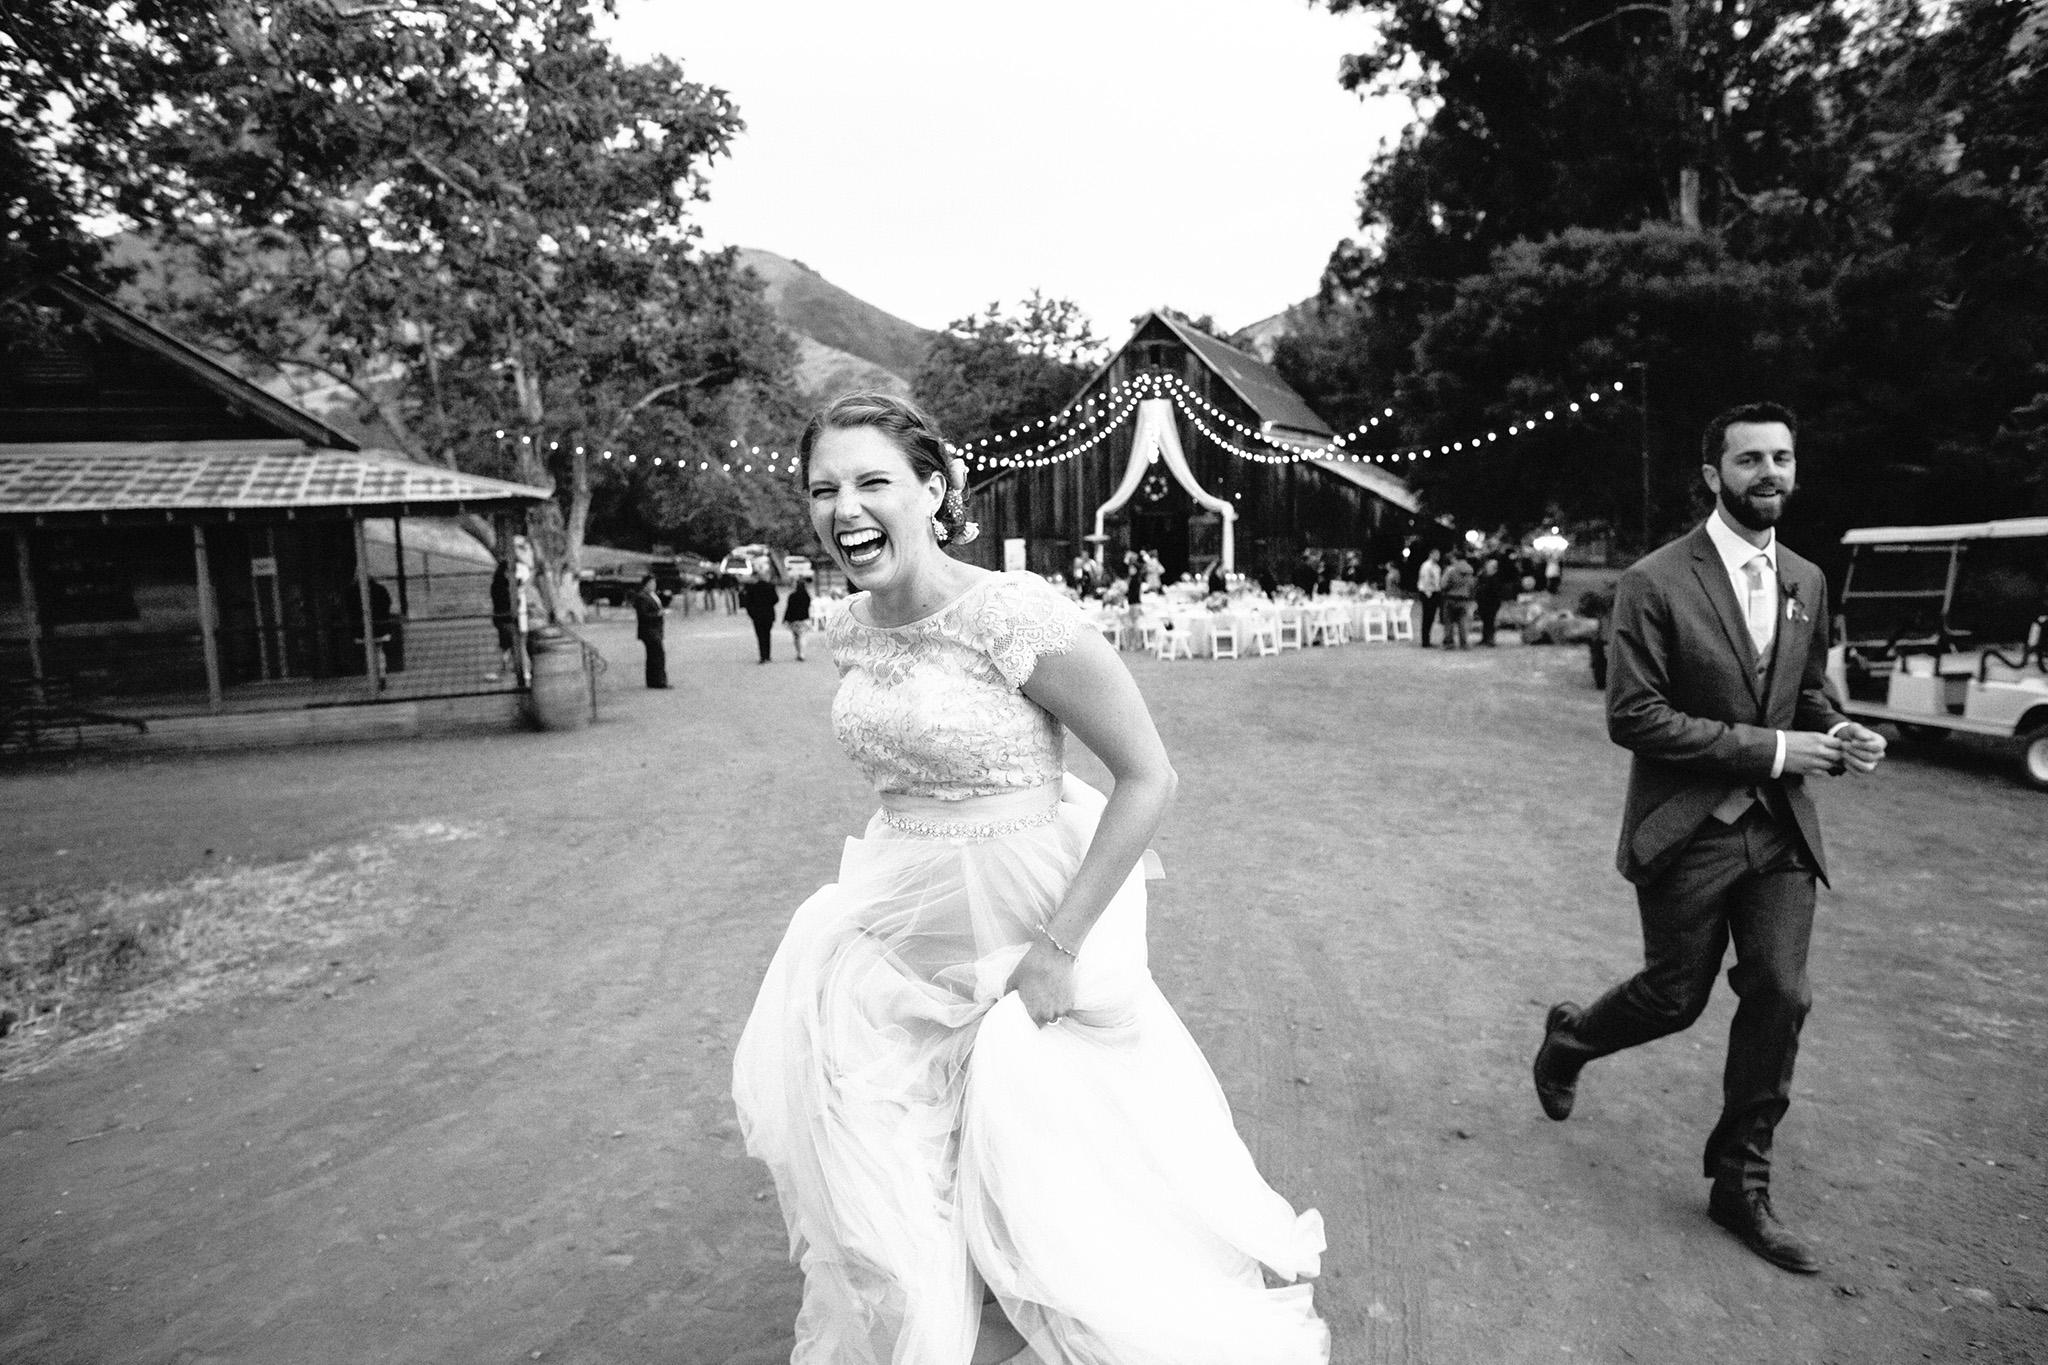 Bride and groom laughing together at their La Cuesta Ranch wedding in San Luis Obispo, CA